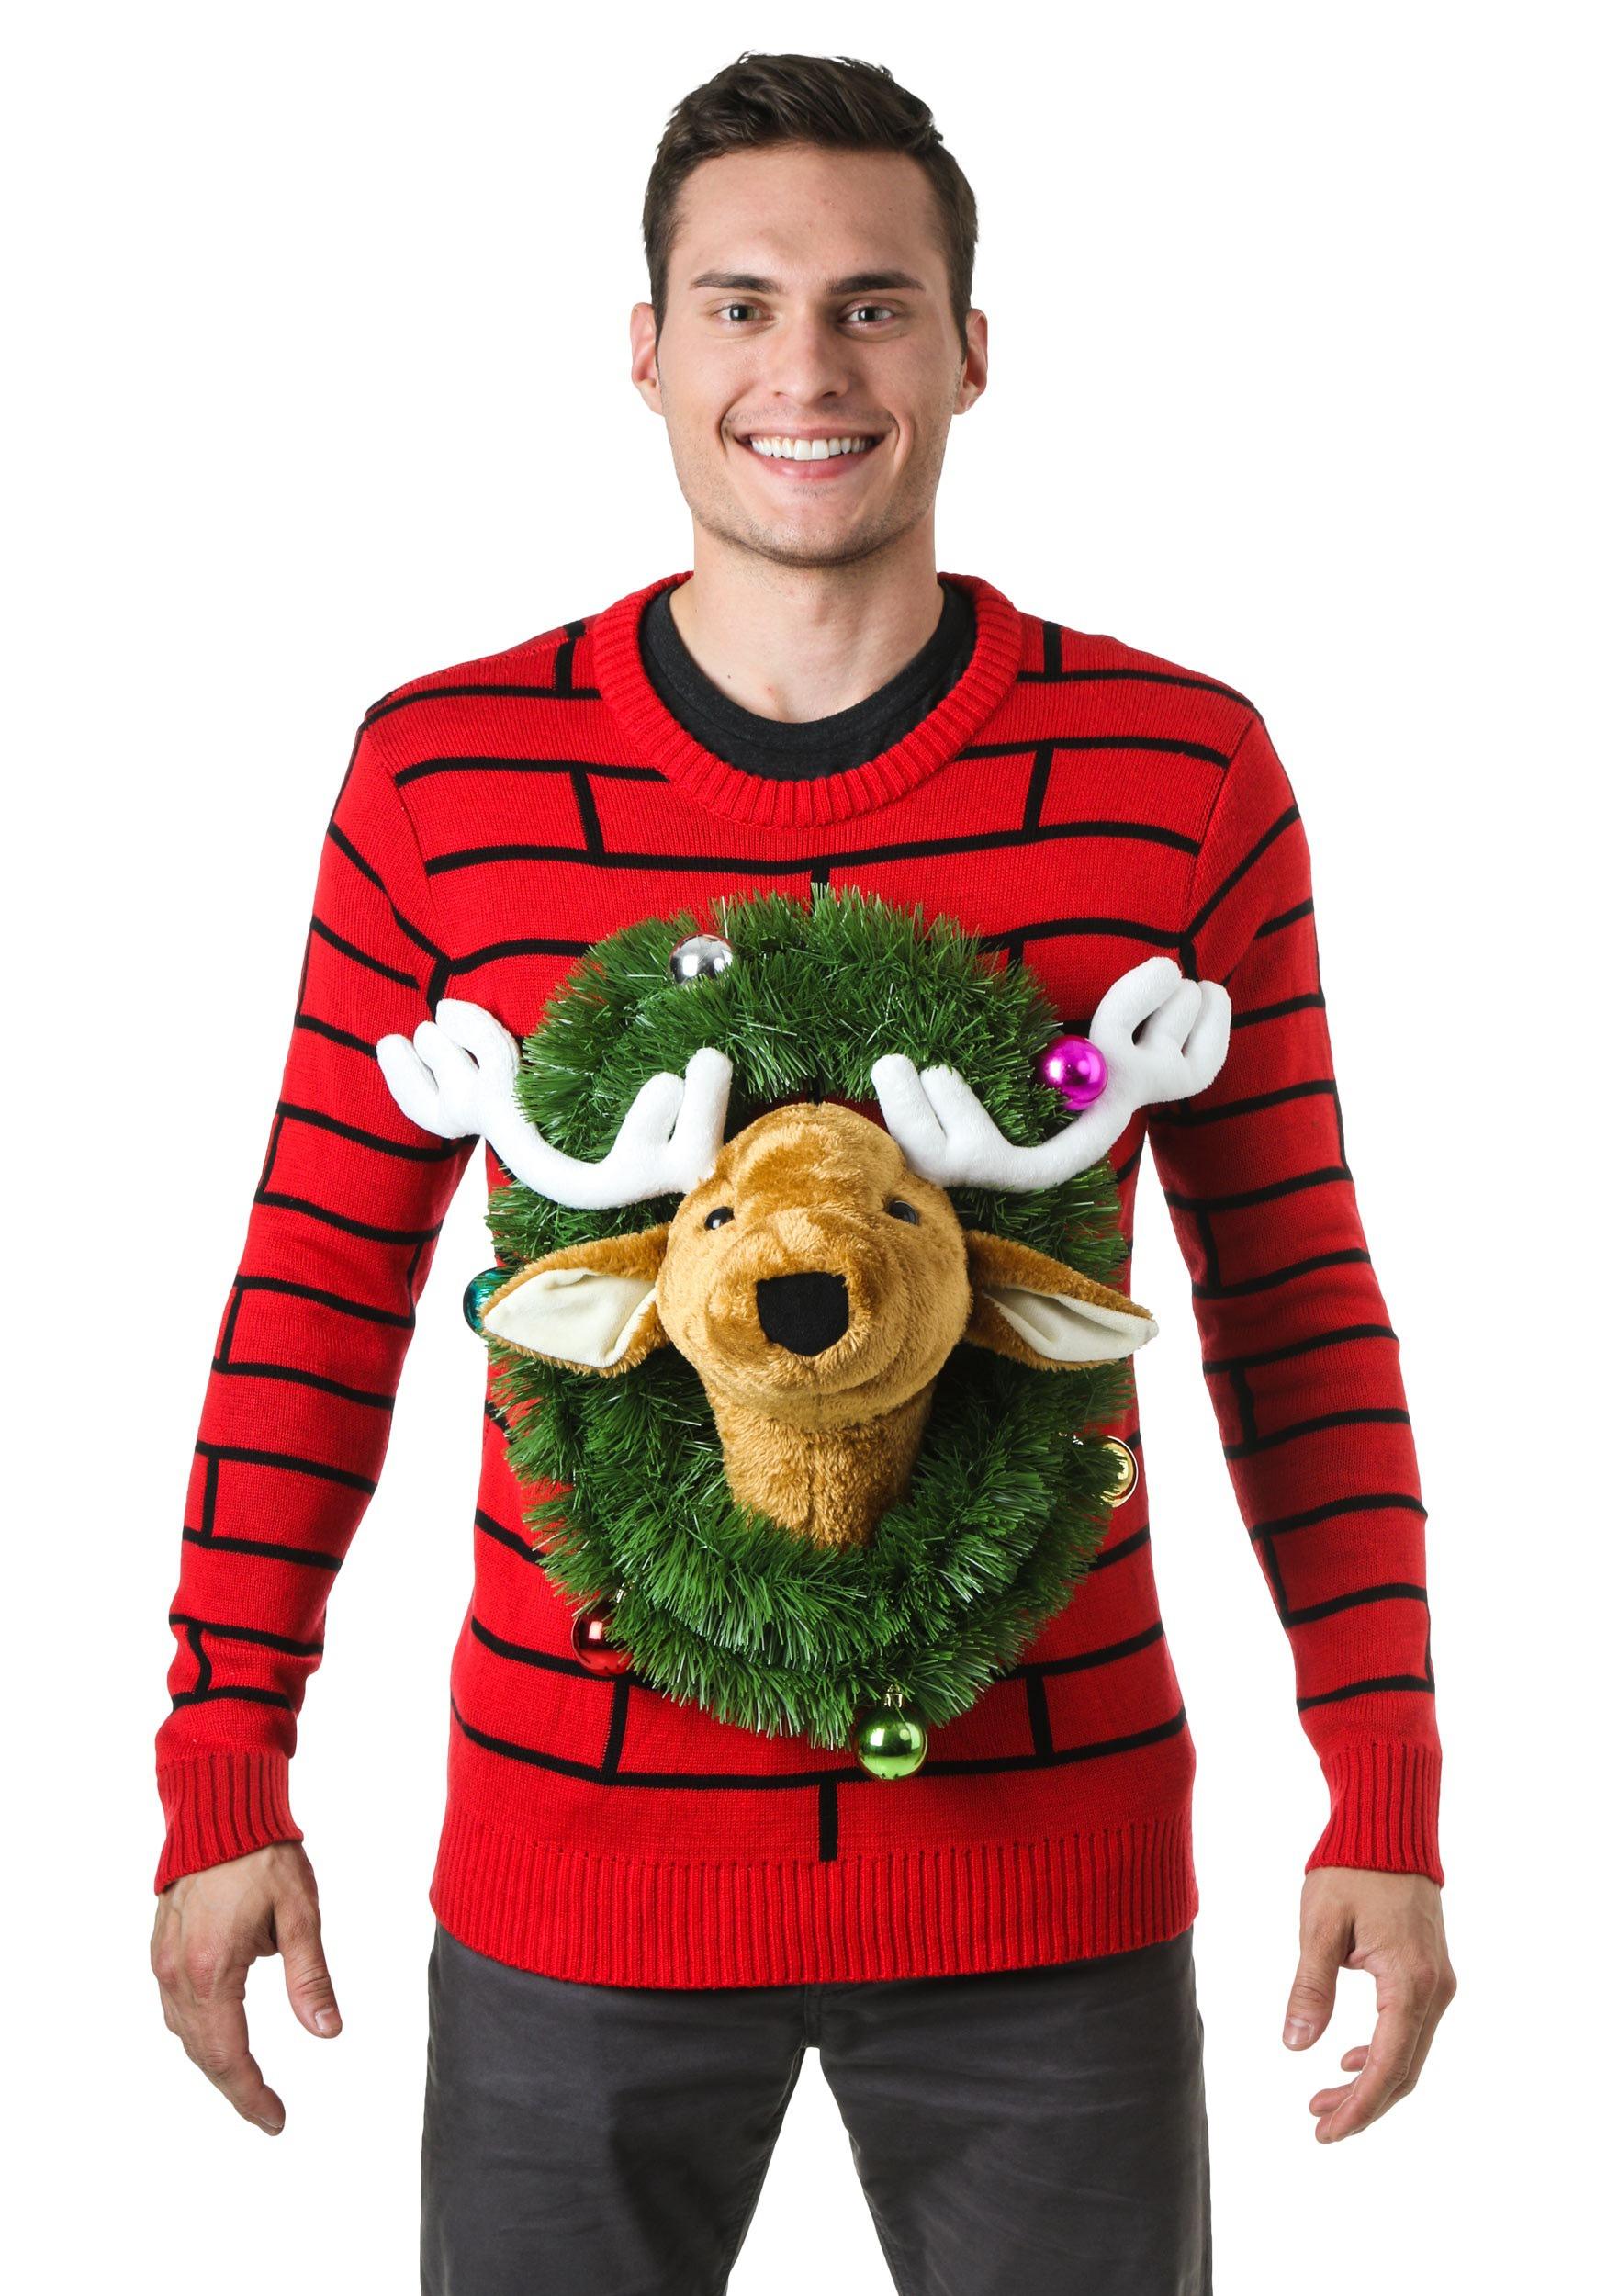 reindeer head ugly christmas sweater - walmart.com oqgfjeh